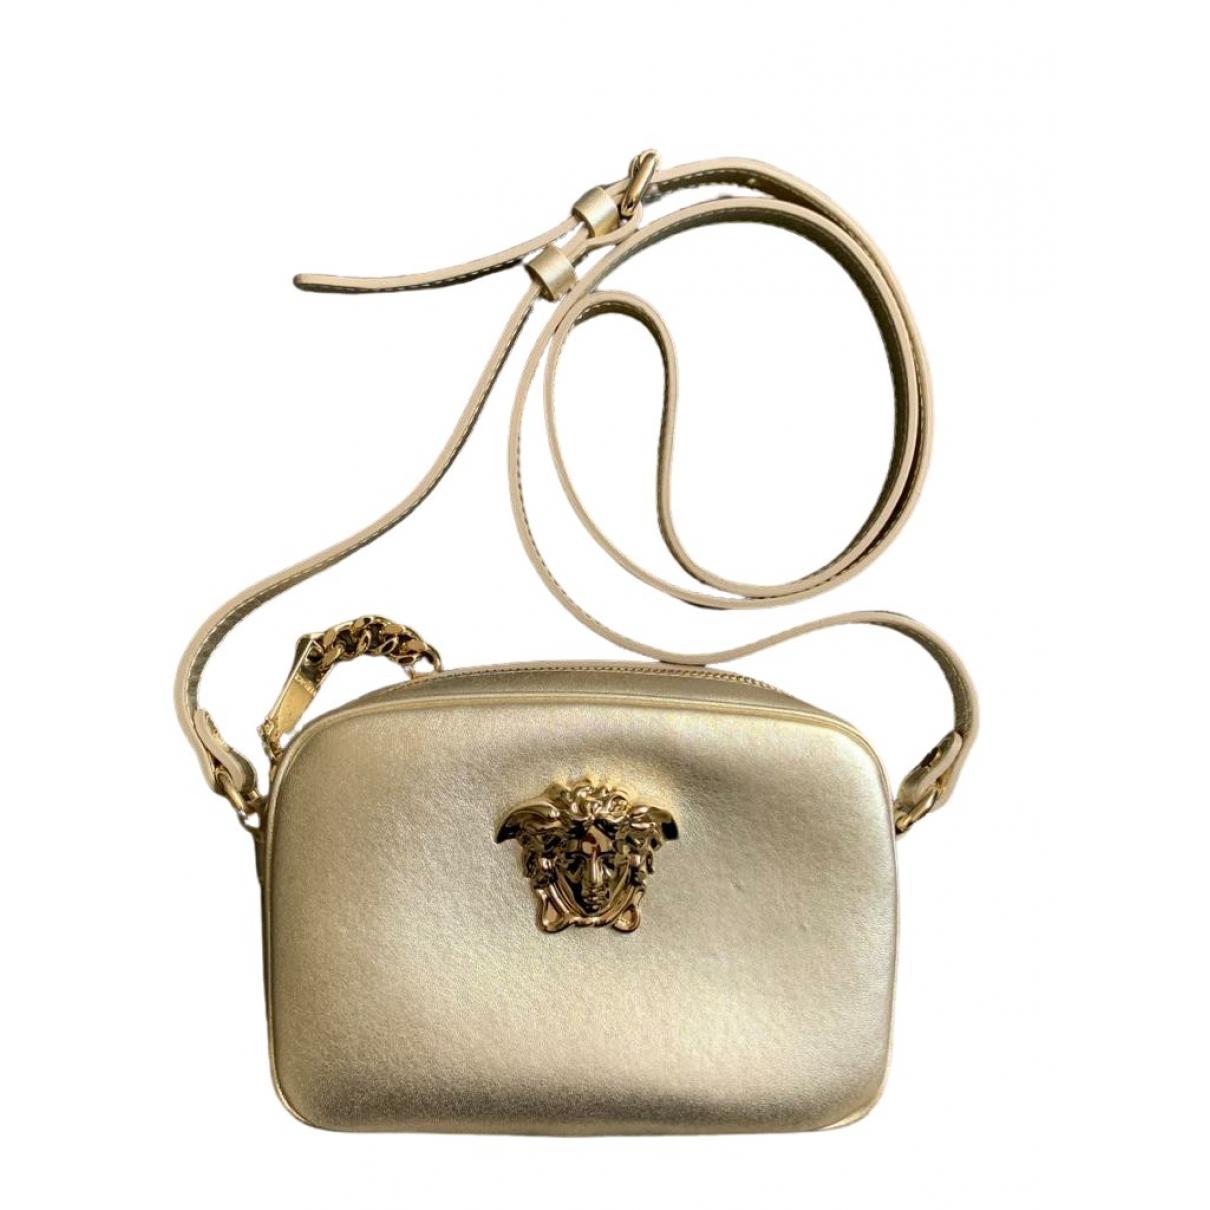 Versace \N Gold Leather handbag for Women \N